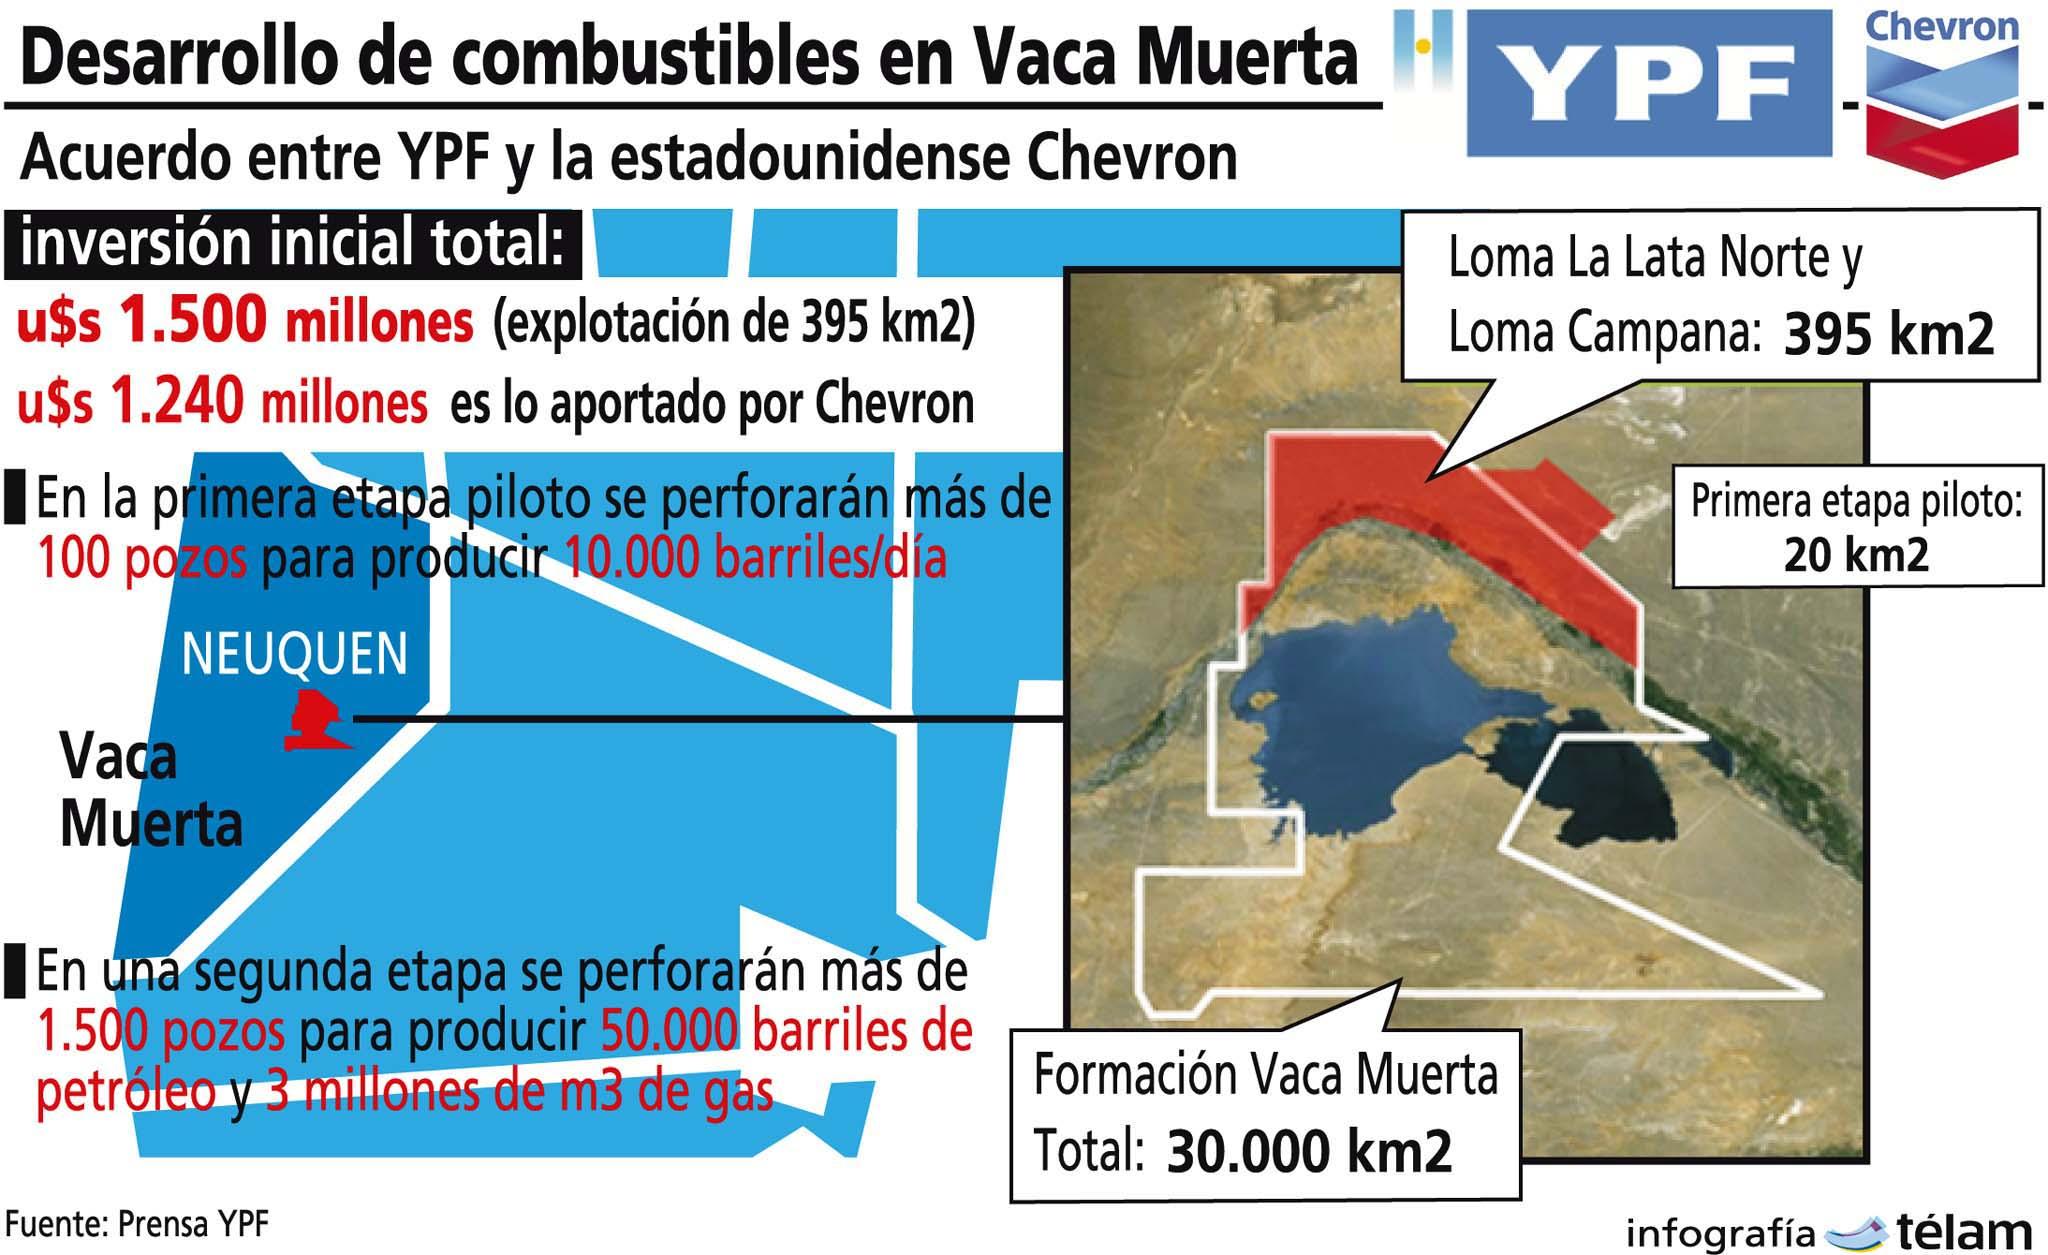 info_Vaca_Muerta_82433